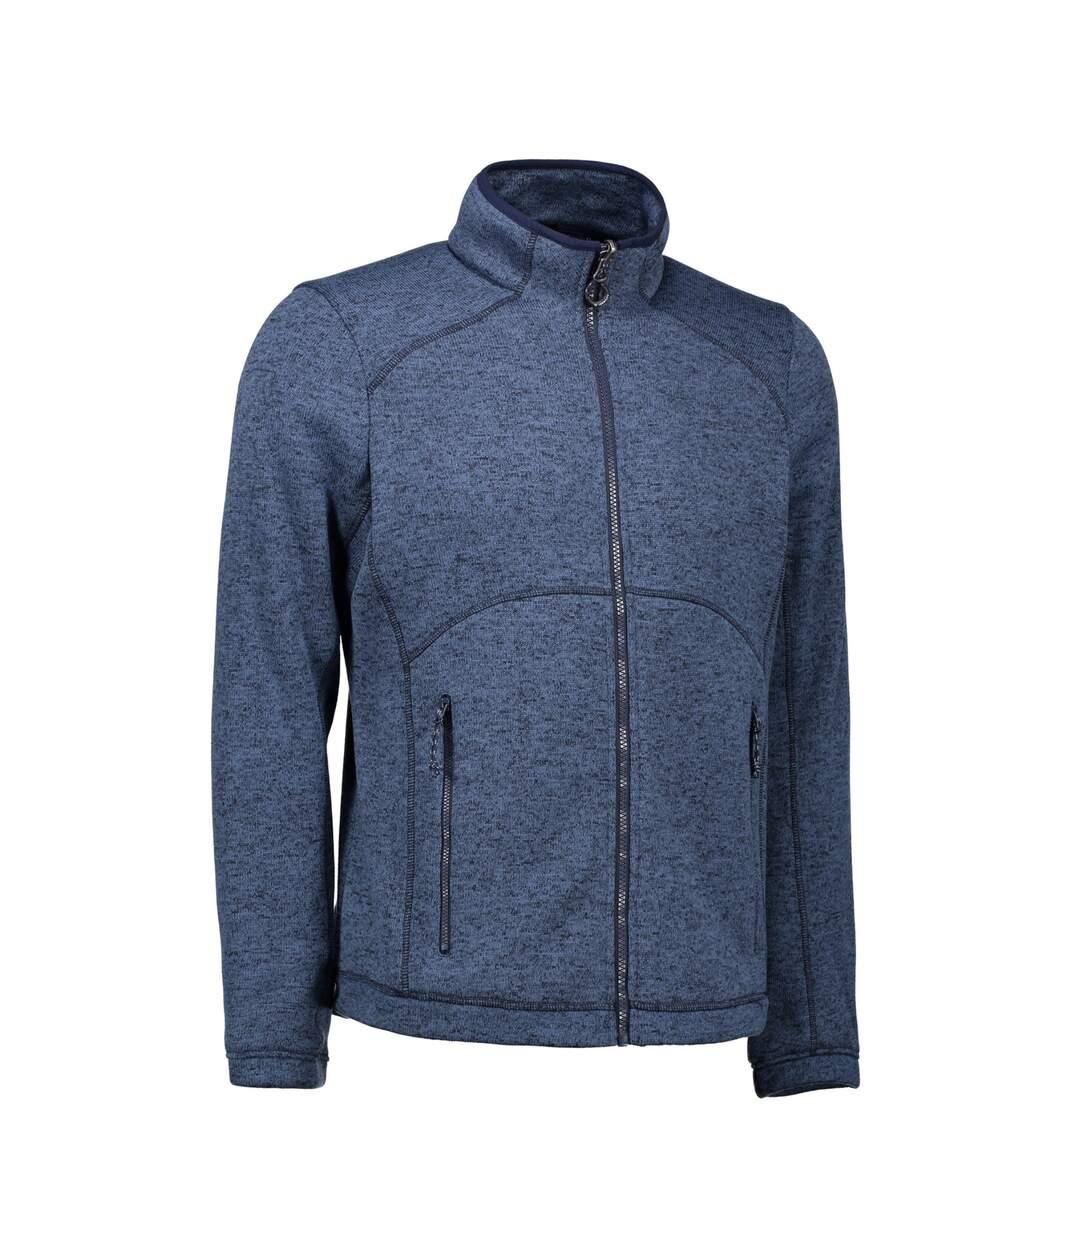 ID Mens Zip N Mix Full Zip Melange Fleece (Grey Melange) - UTID427